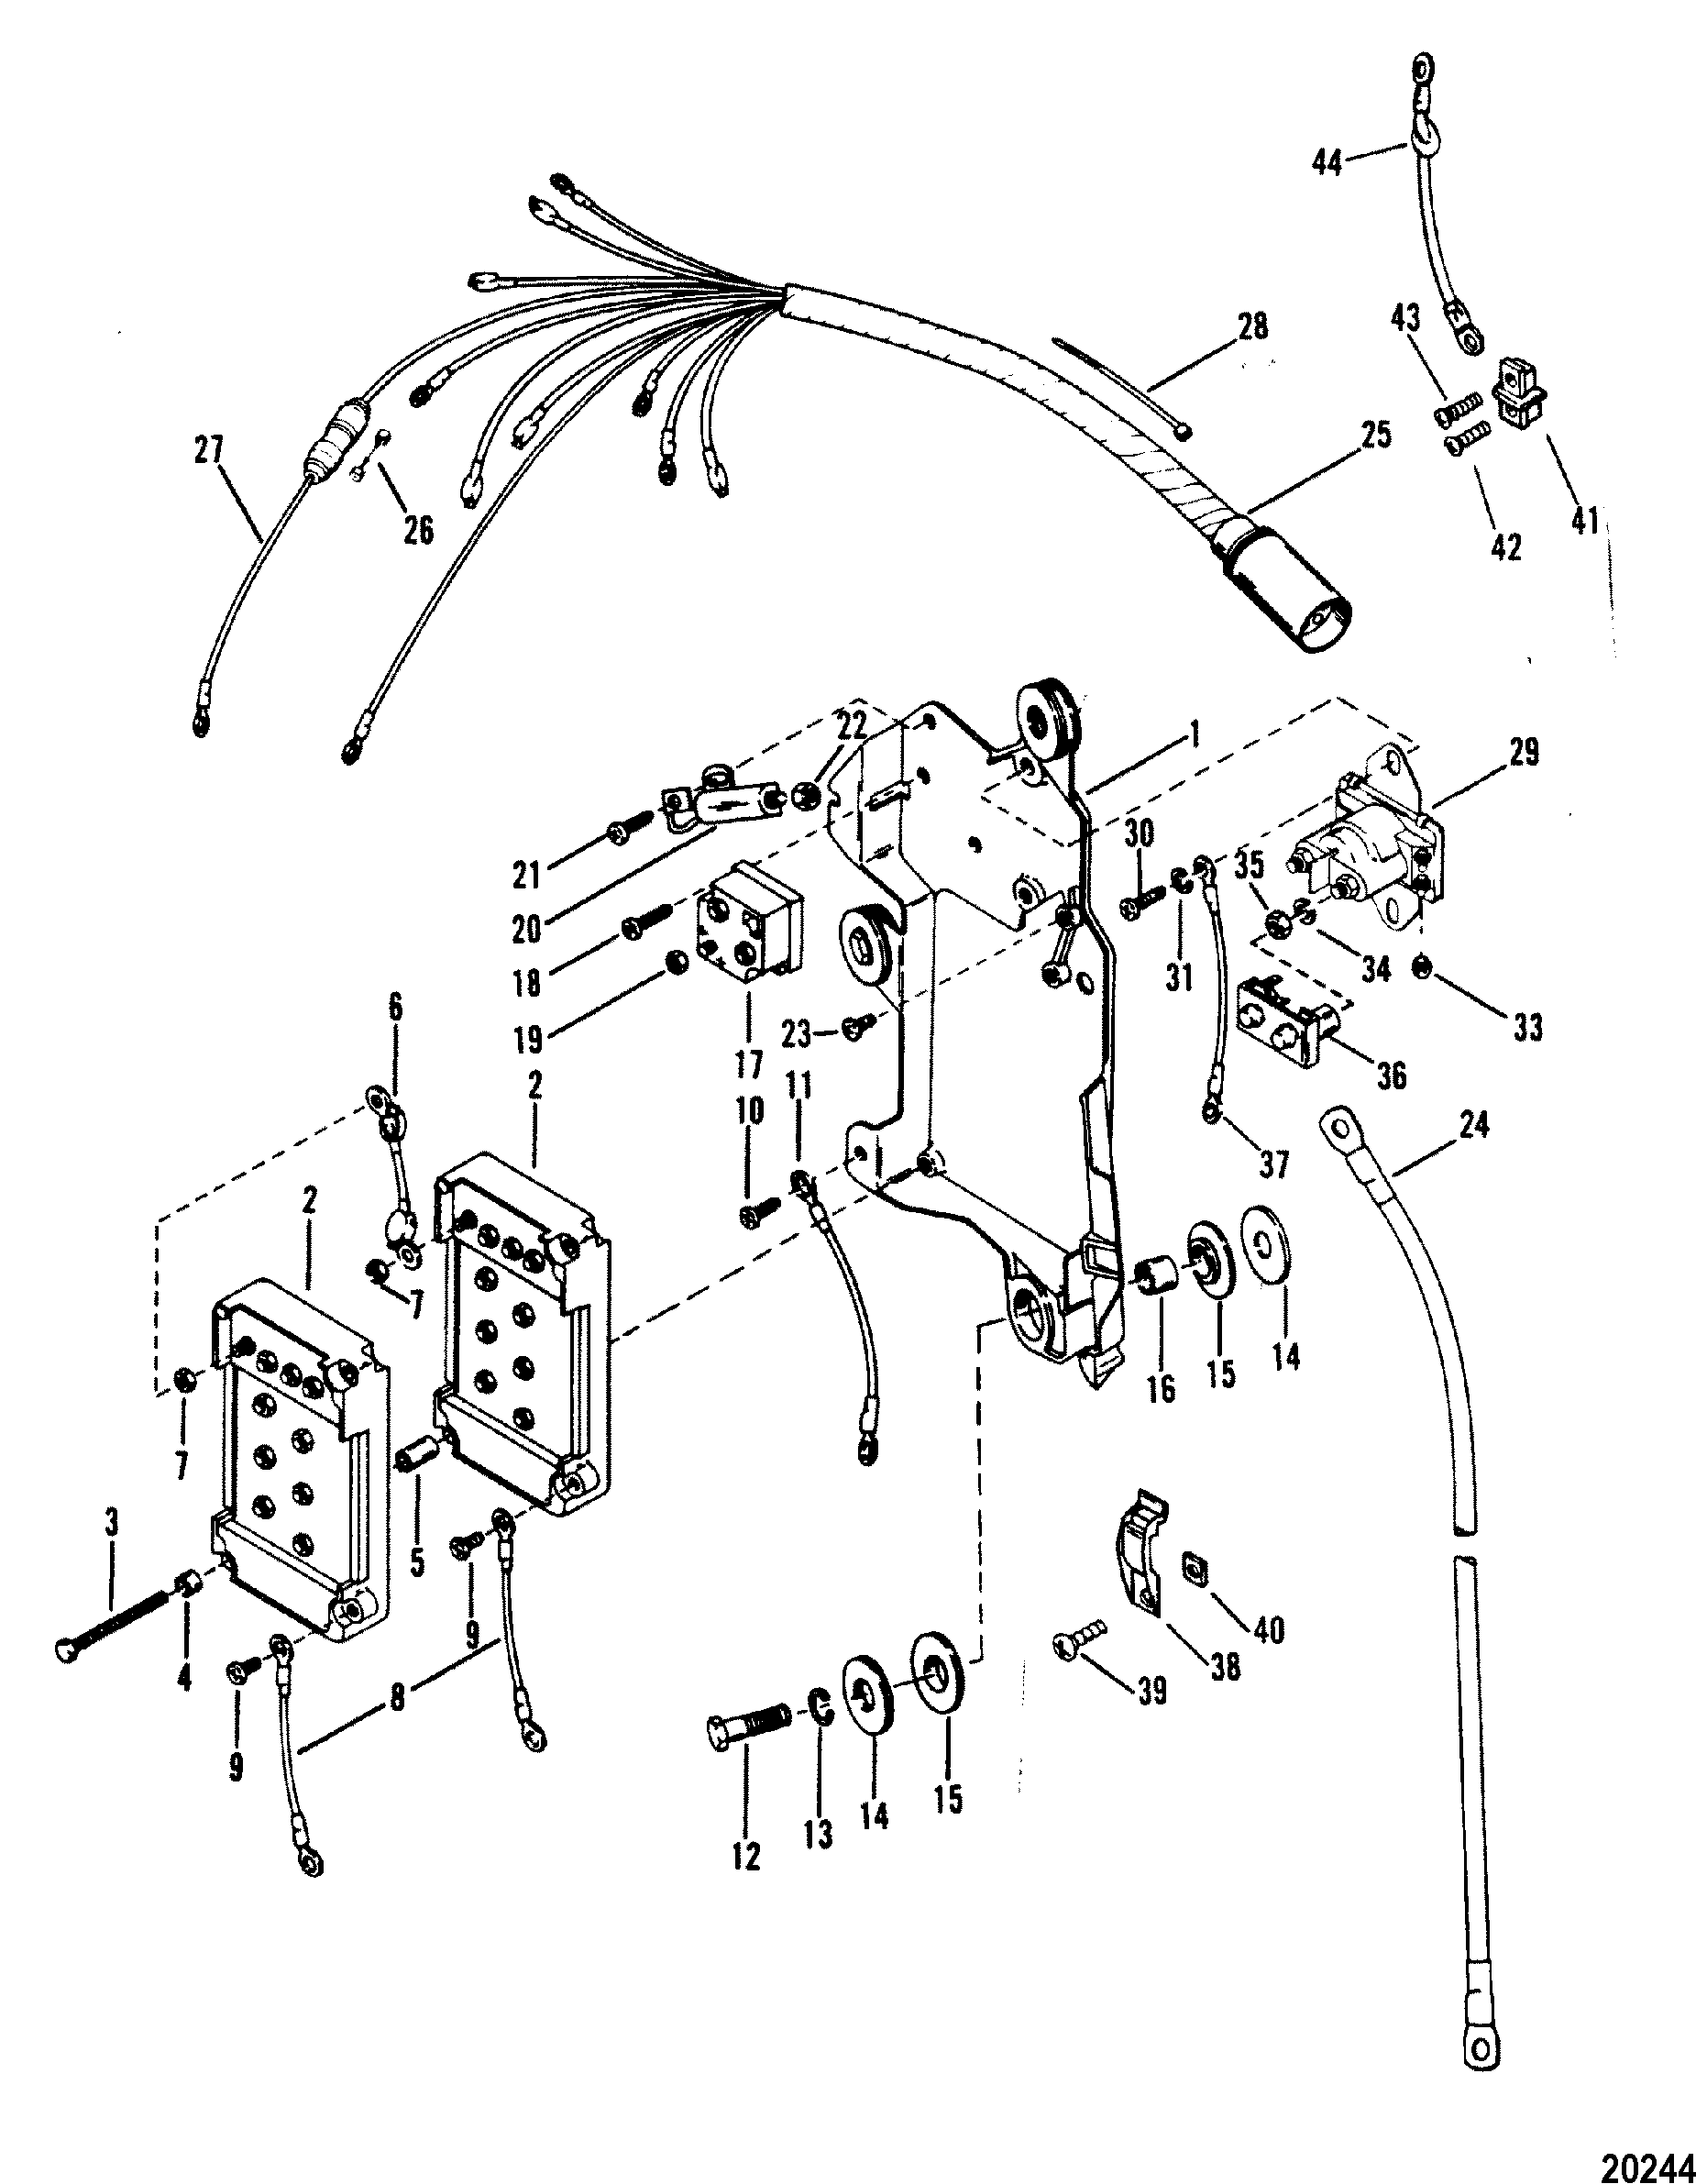 Mercury Mariner V 150 5600162 Thru 0a904645 Wiring Harness Merc Starter Solenoid And Rectifier